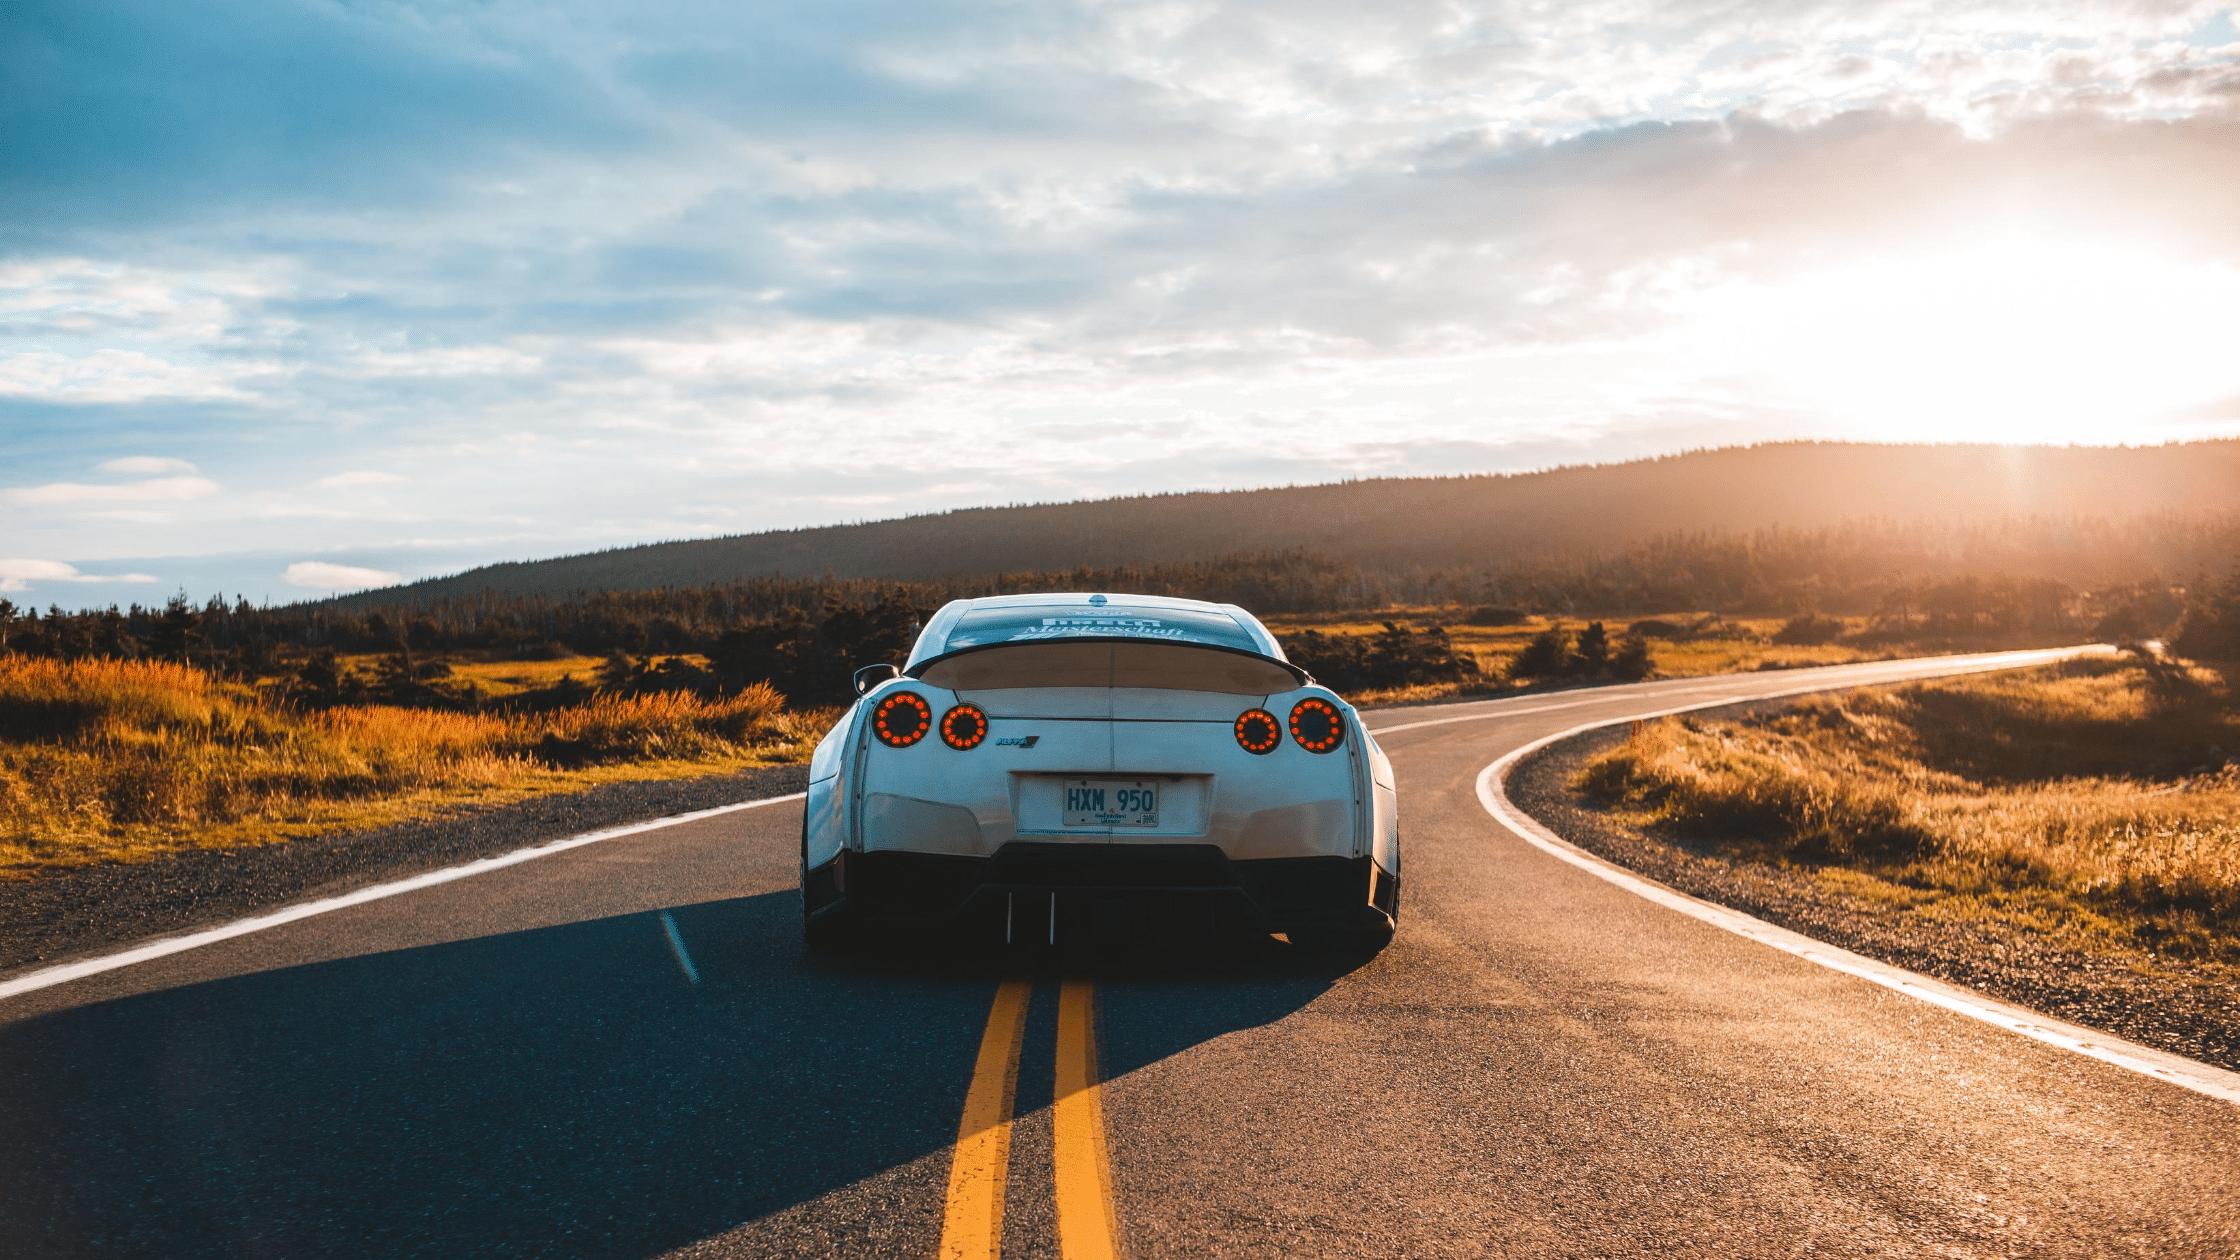 car accident liability